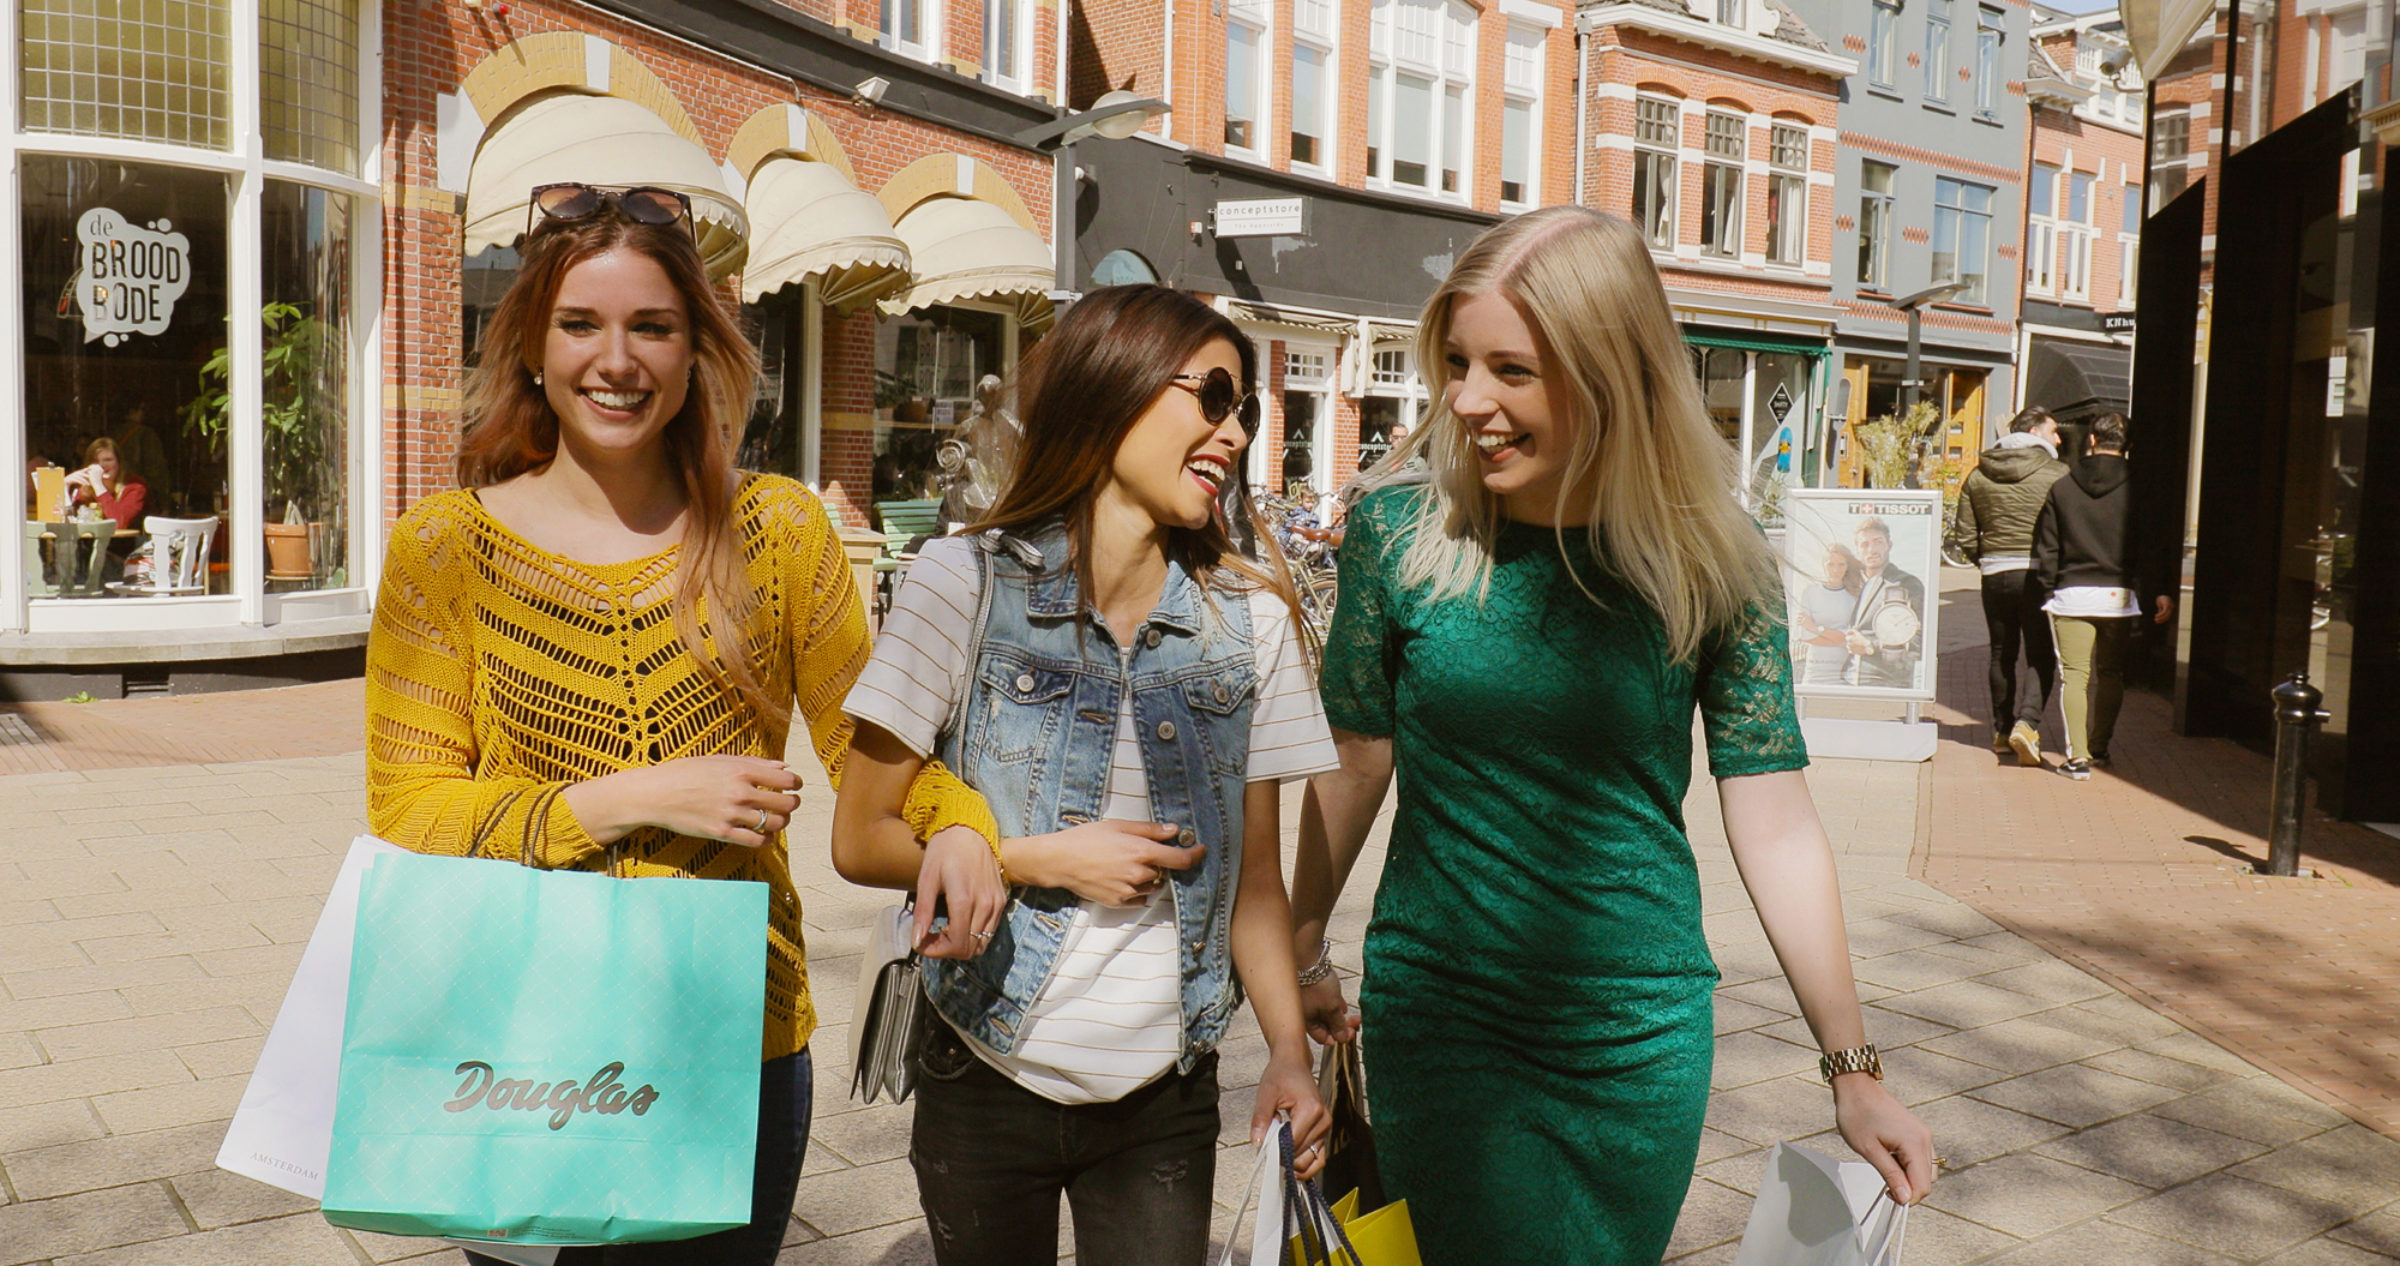 Shoppen in Enschede